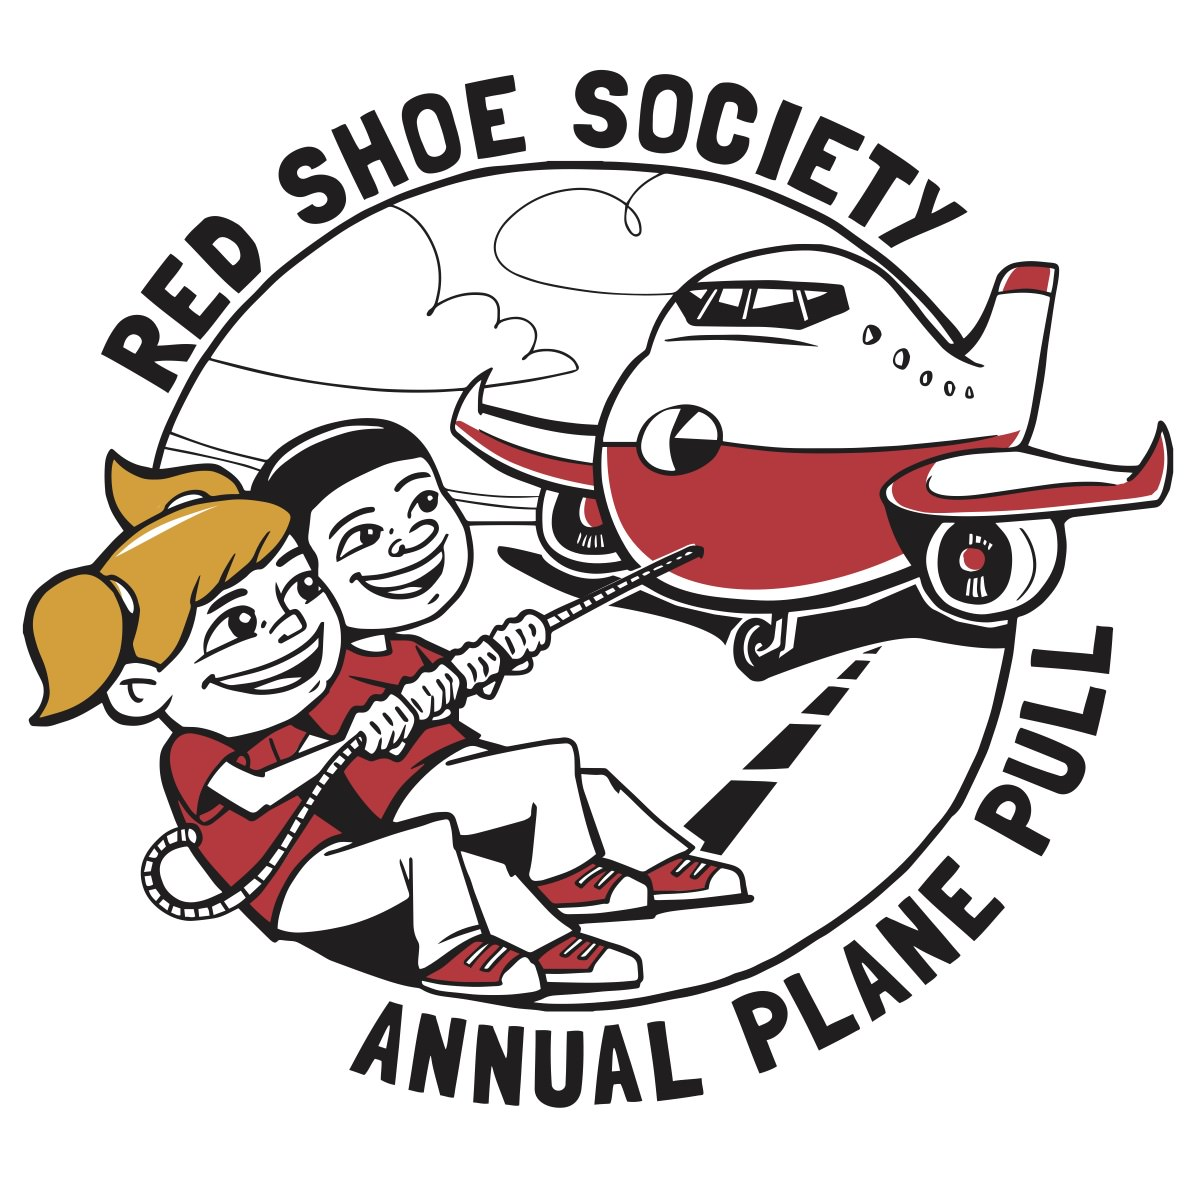 RSS Plane Pull